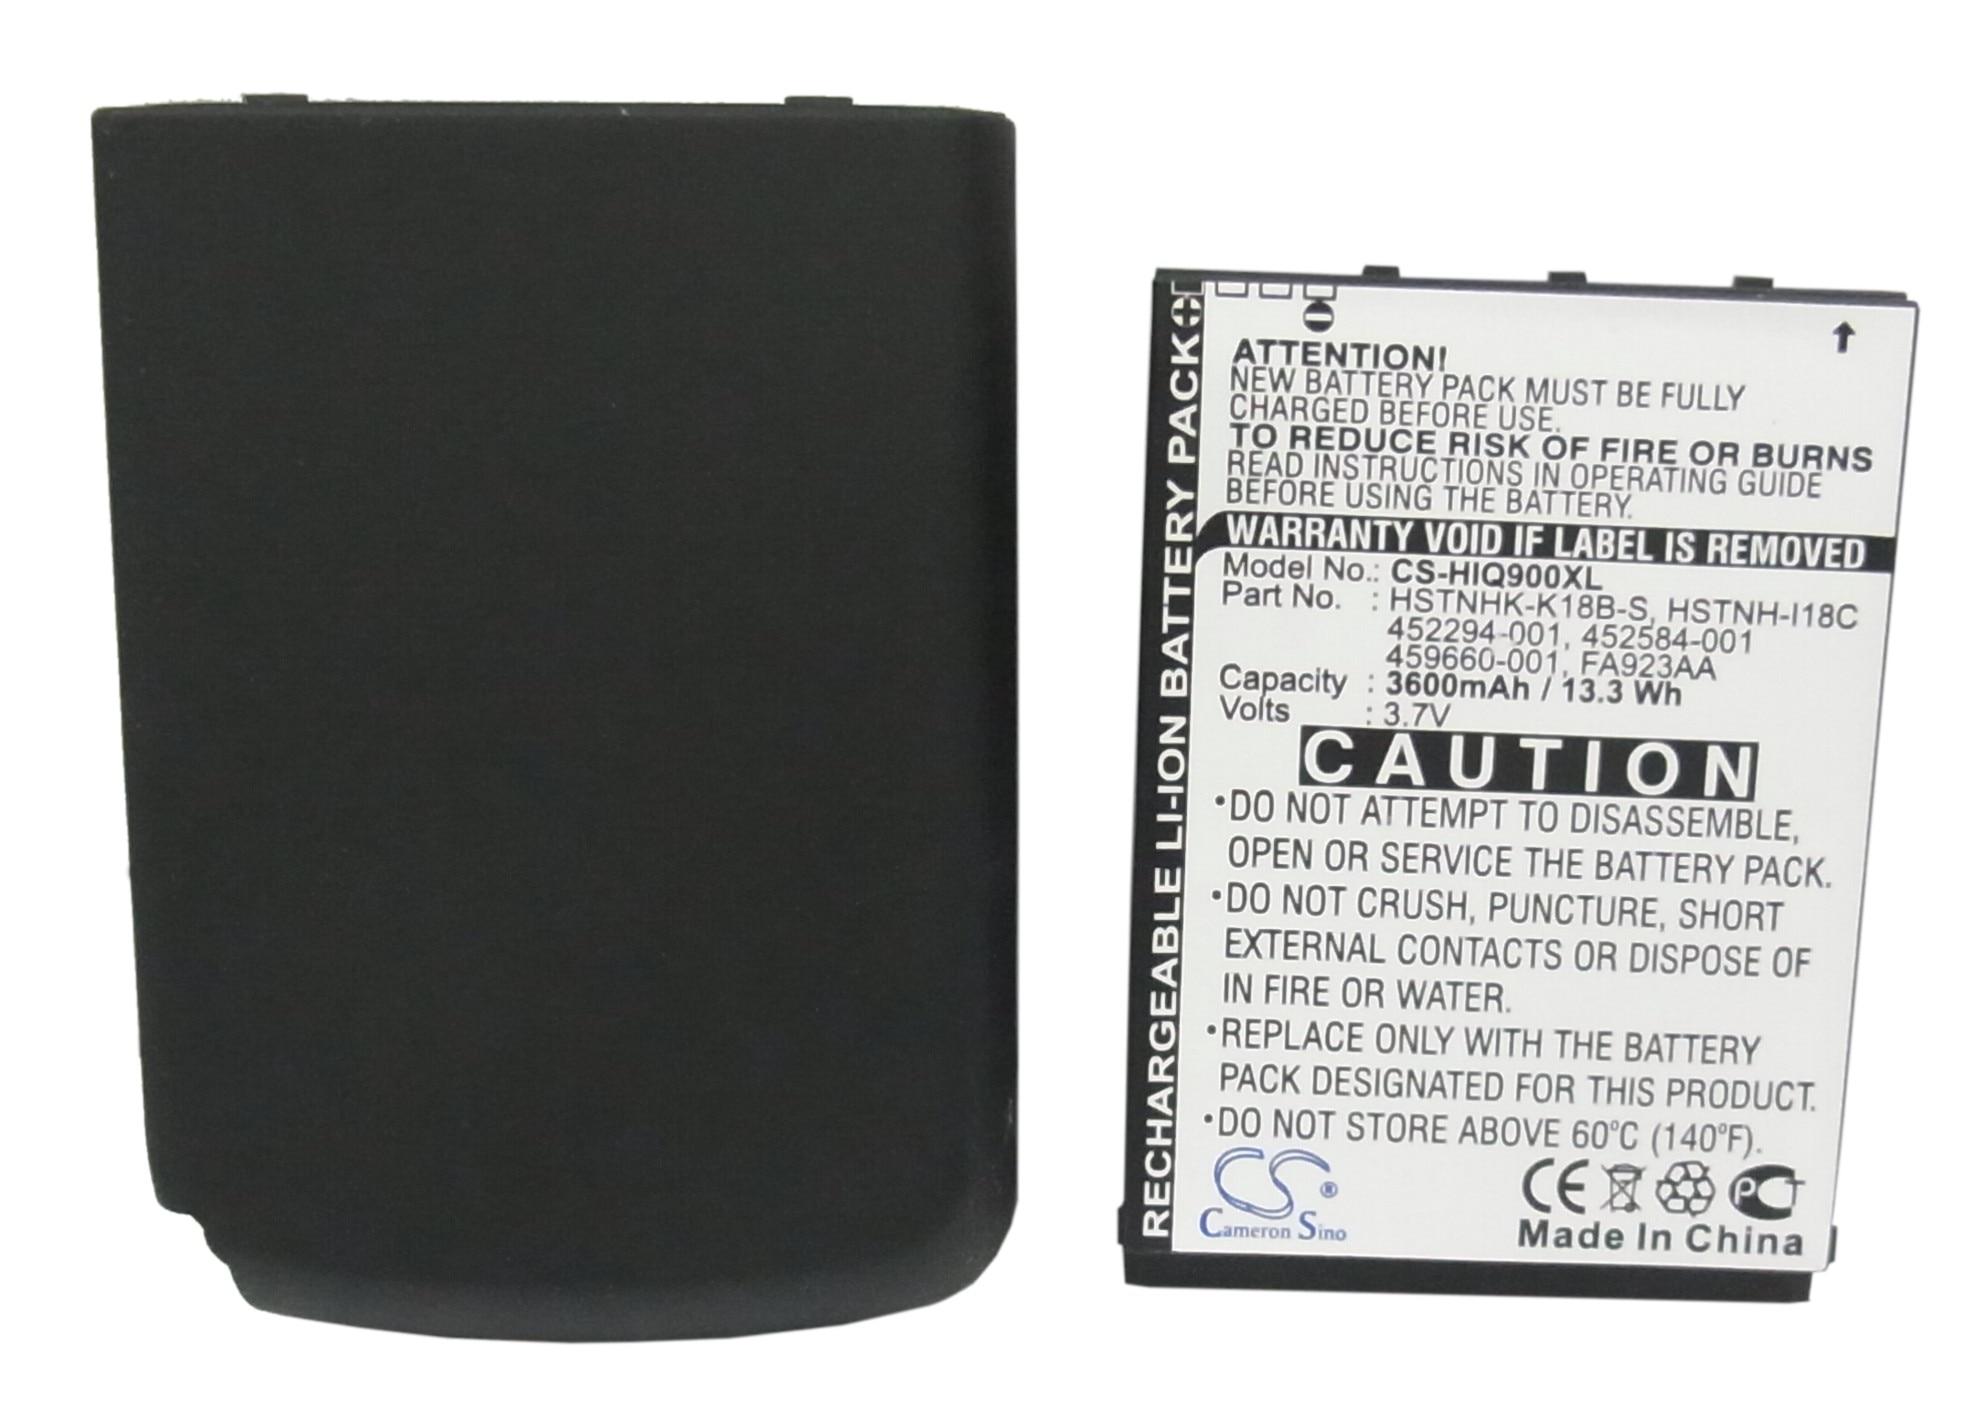 Cameron sino 3600 mah bateria 452294-001, fa923aa, HSTNHK-K18B-S para hp ipaq 900, 910, 910c, 912, ipaq 912c